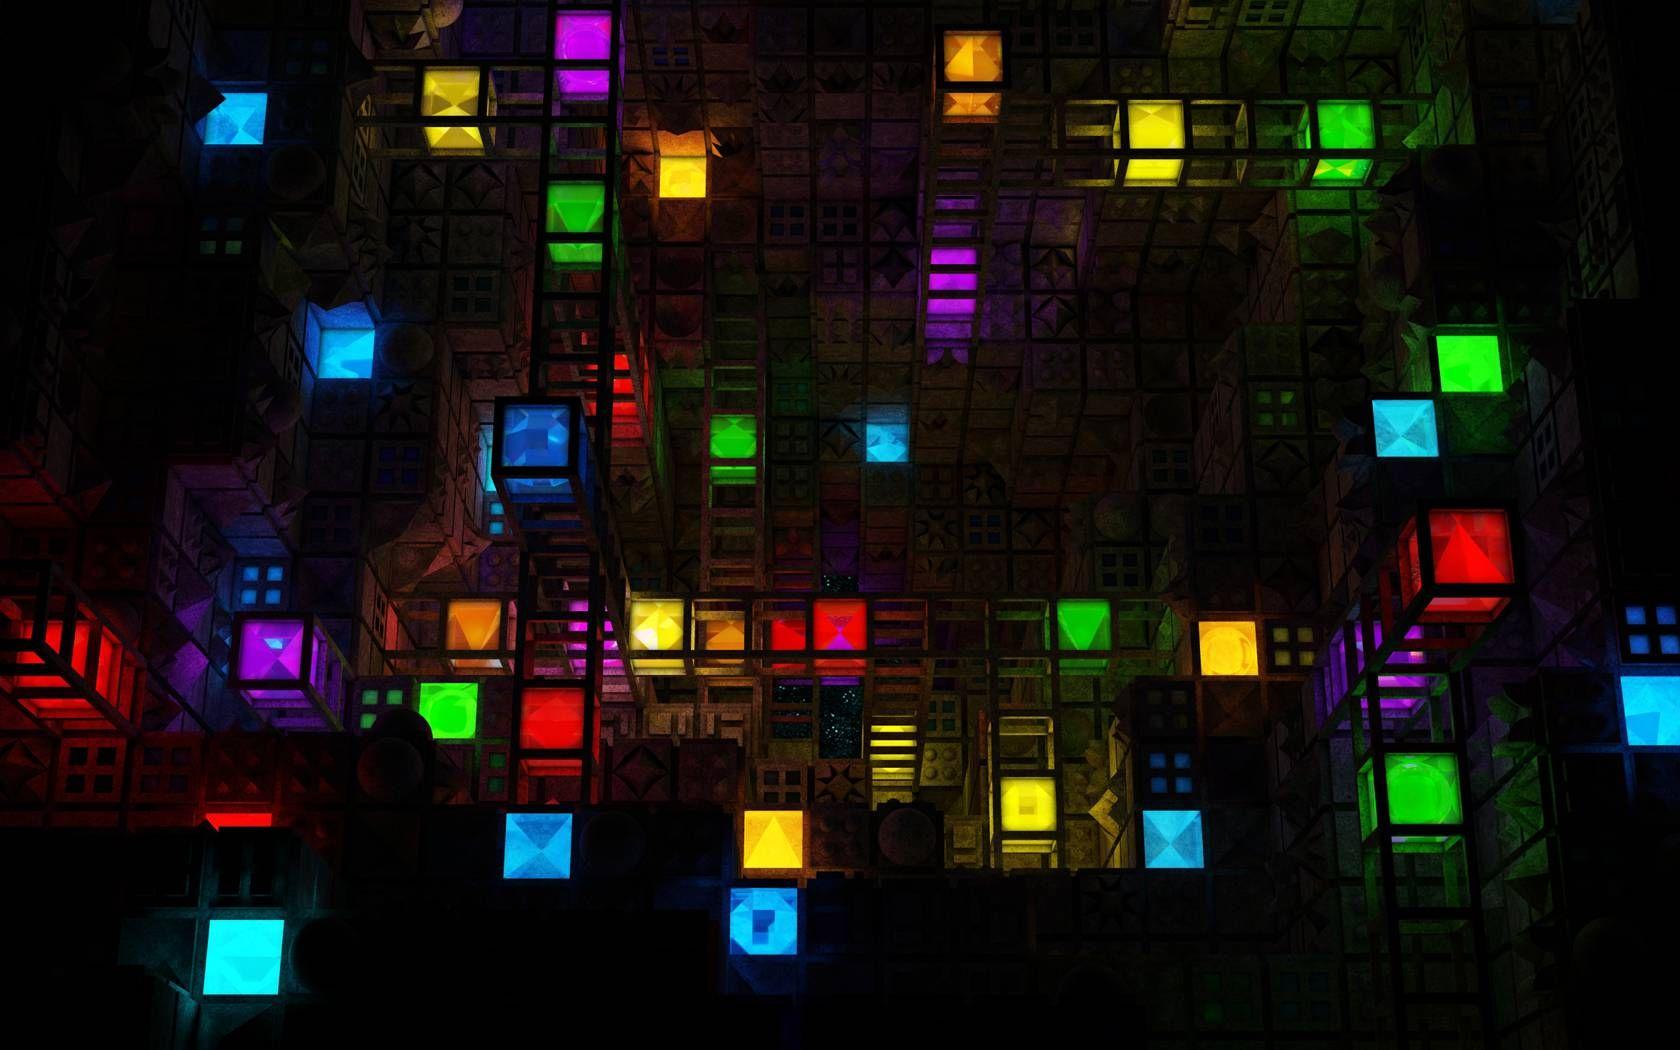 bright neon colors - Google Search | Dark and Light | Pinterest